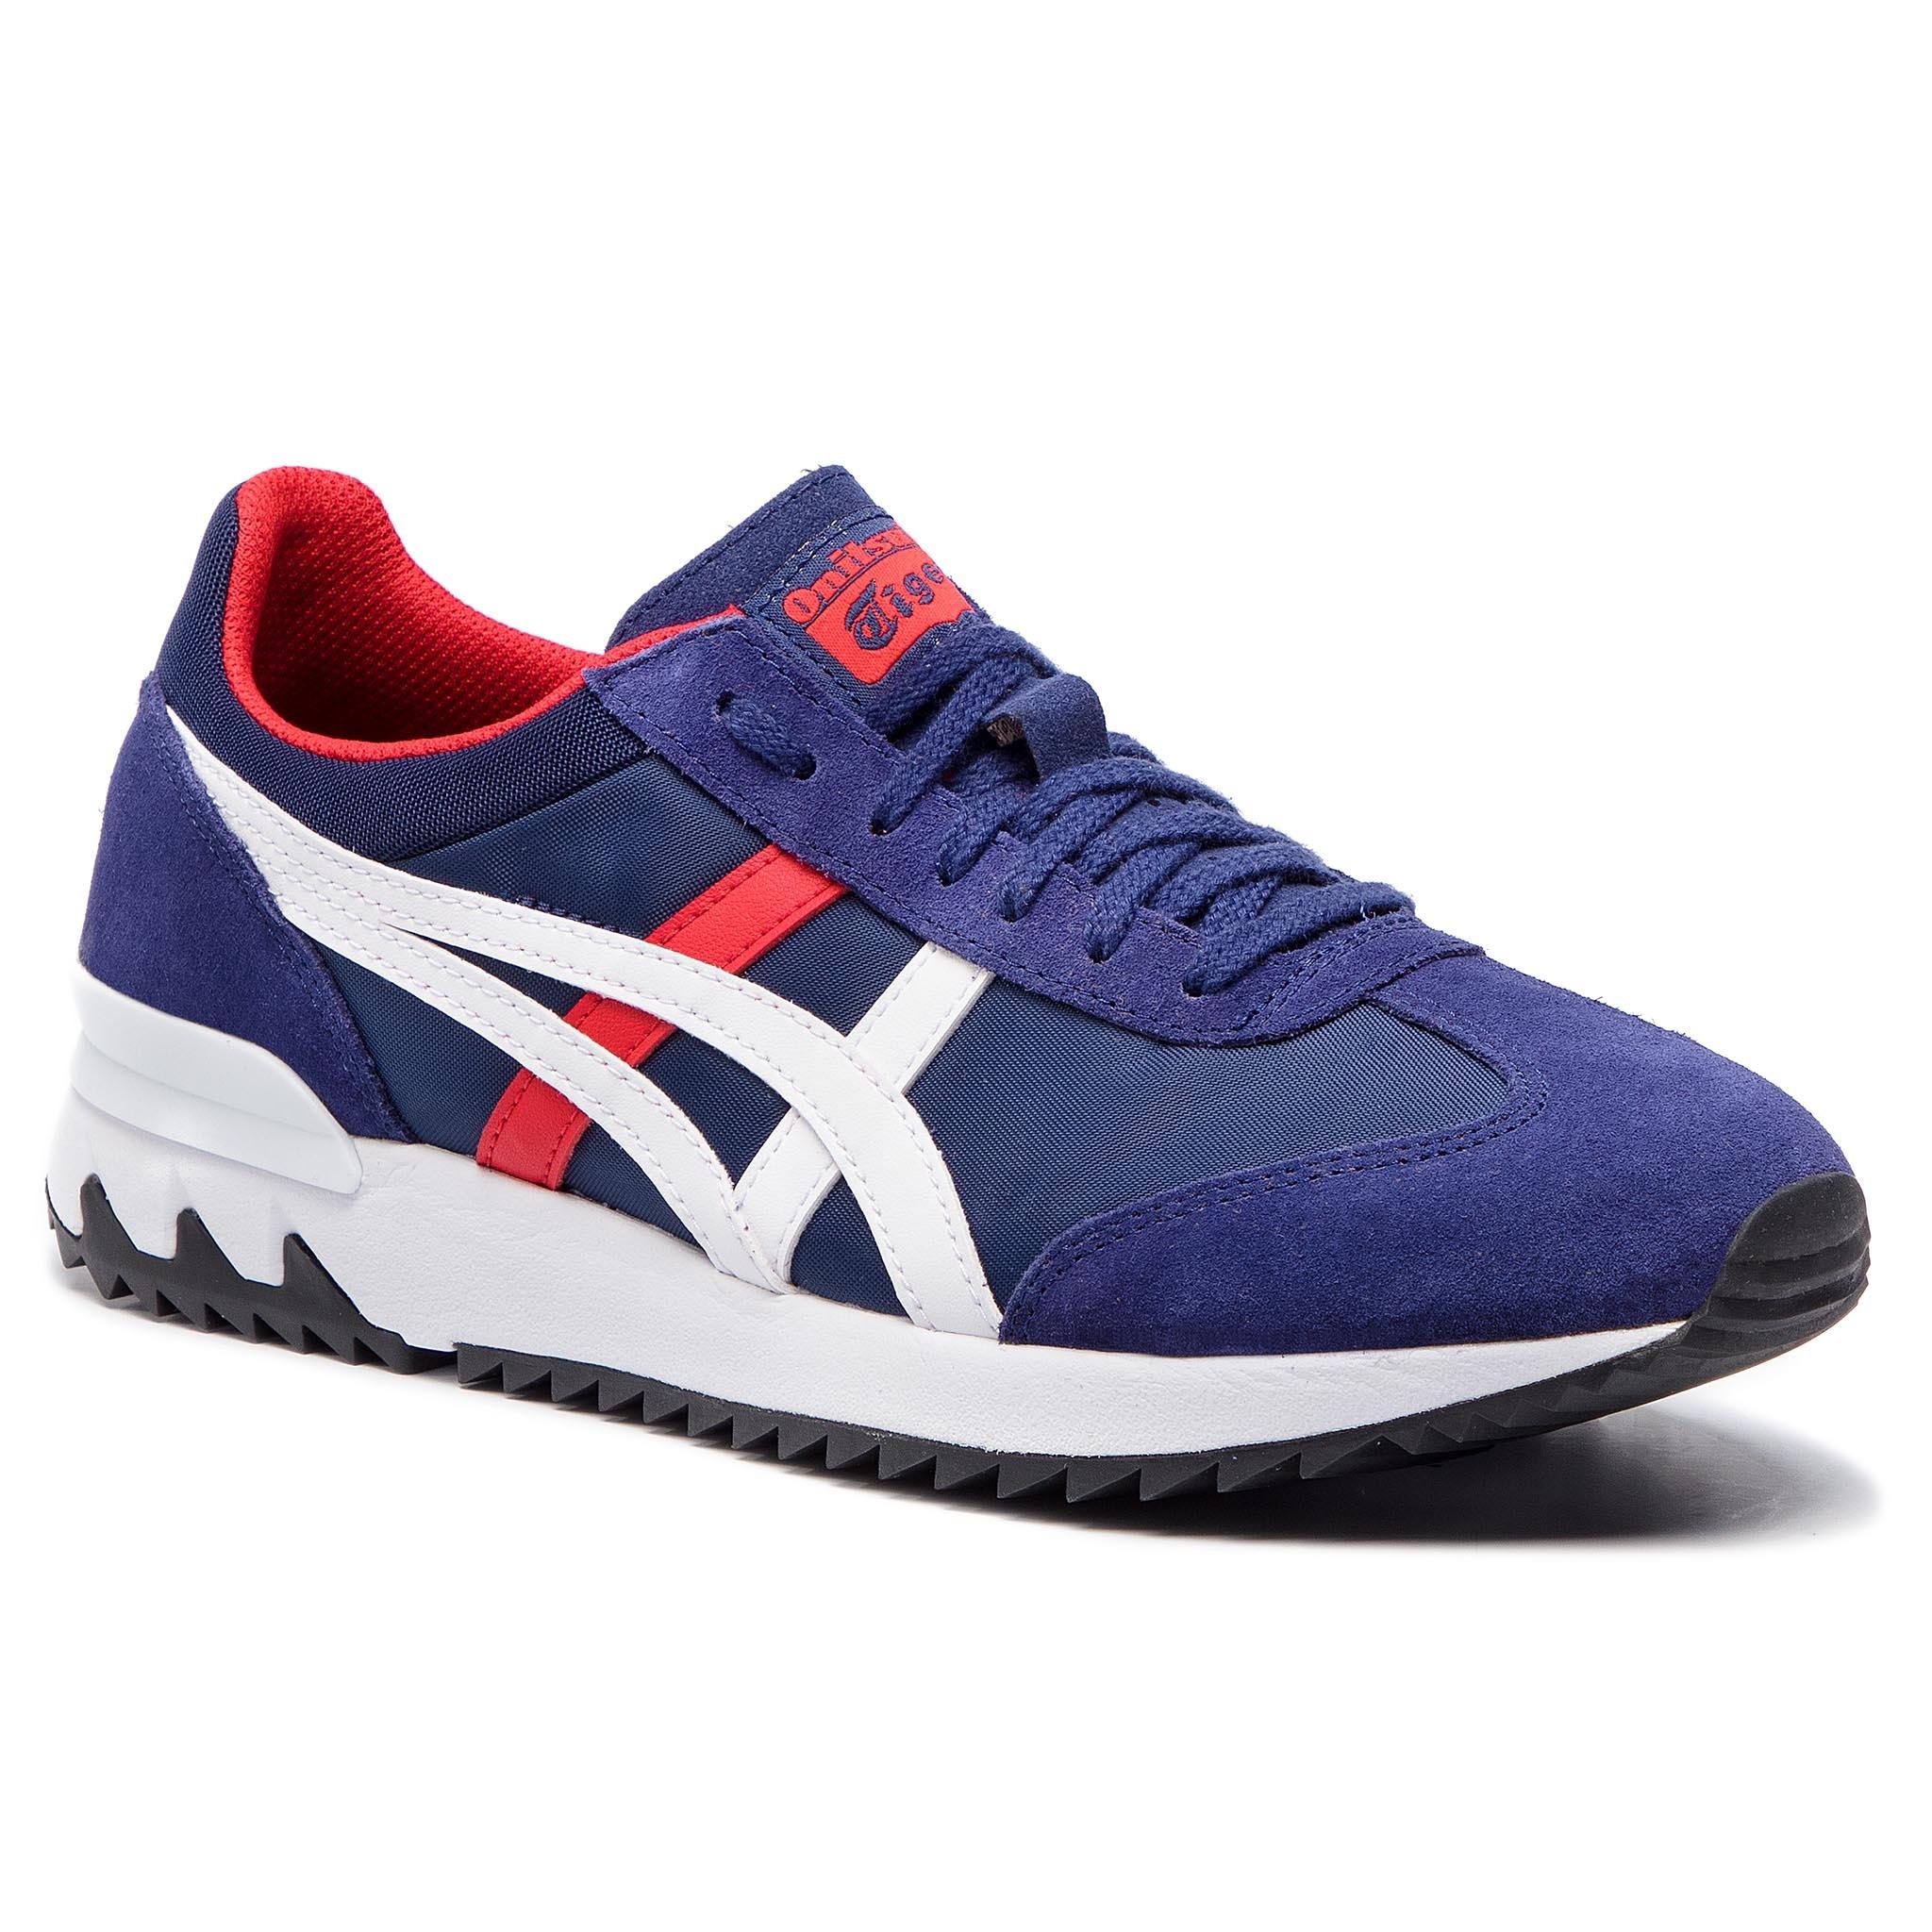 cheap for discount 2708c ec9cd Sneakers ASICS - ONITSUKA TIGER California 78 Ex 1183A355 ...